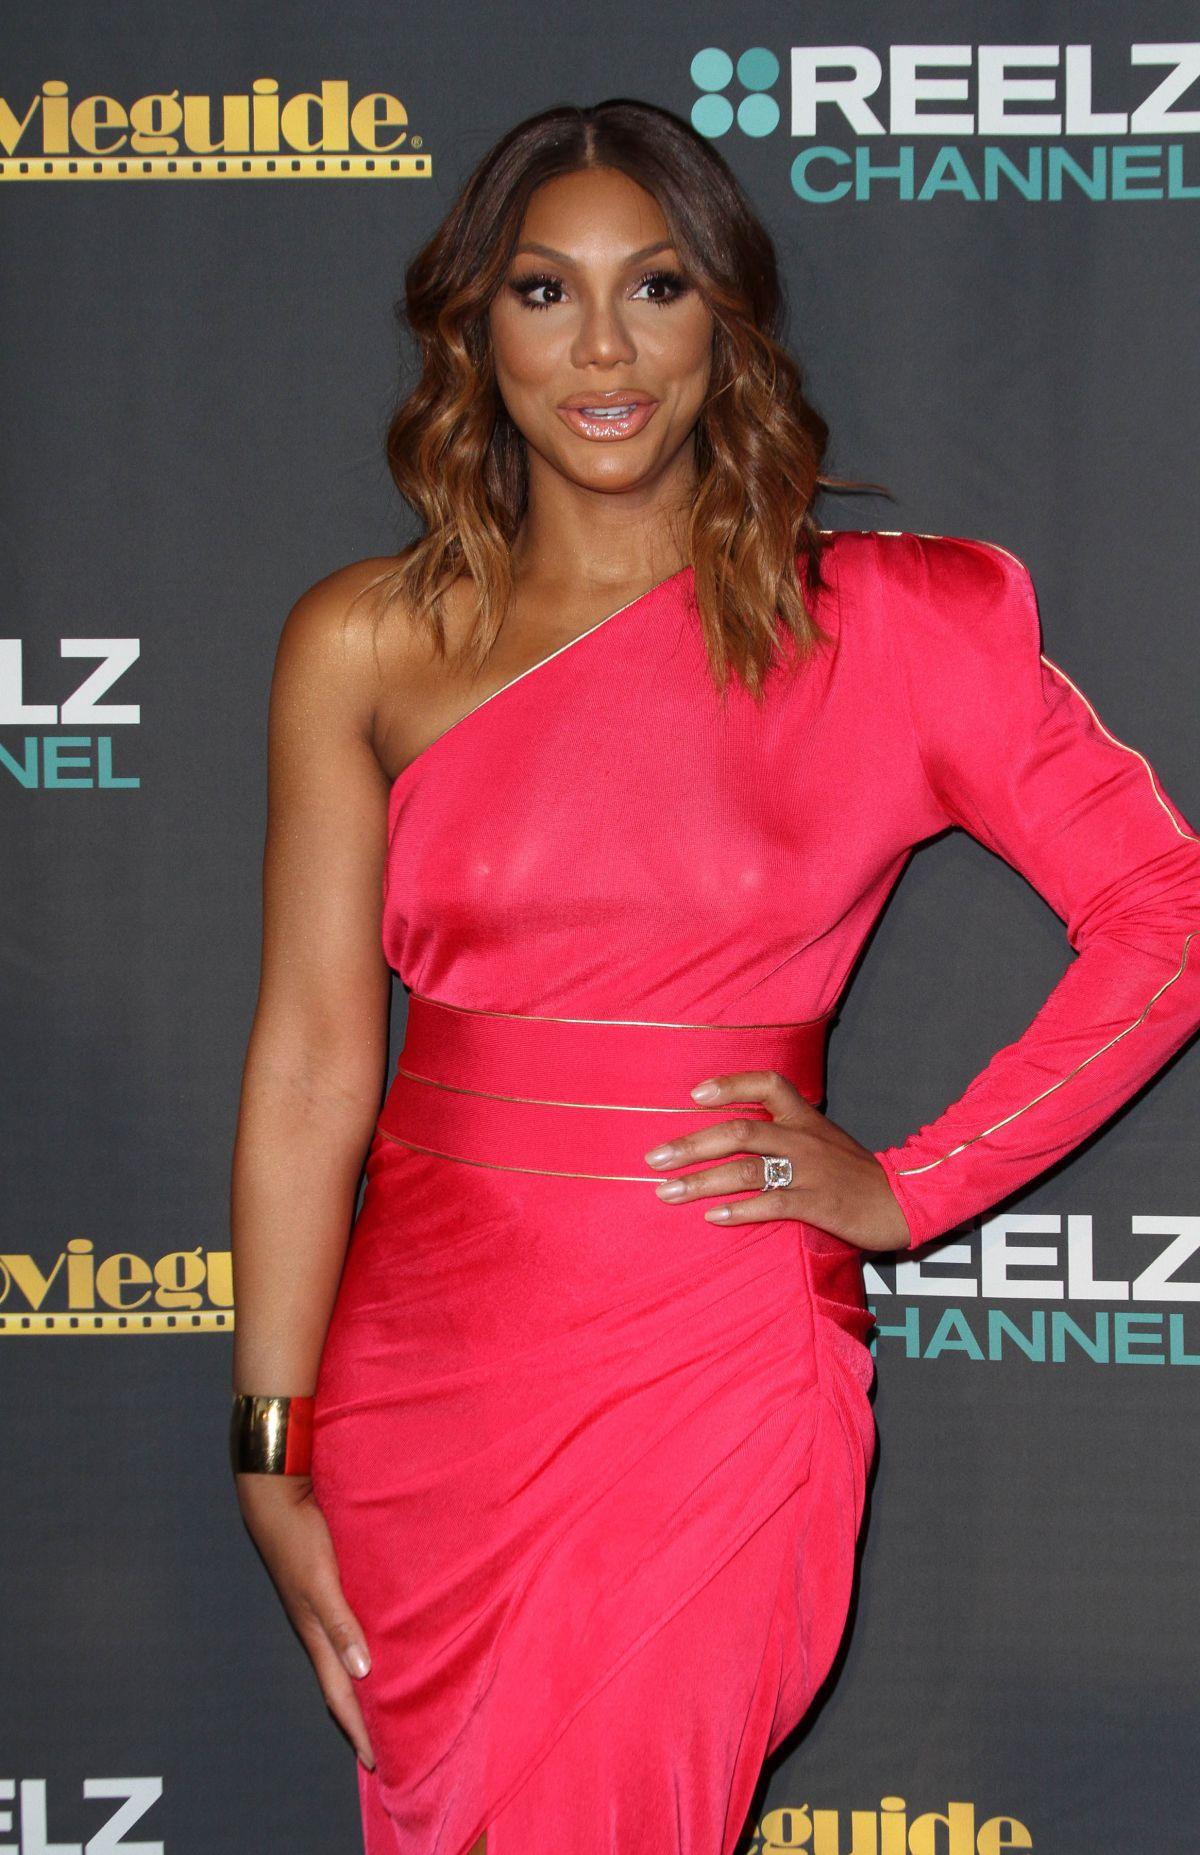 TAMAR BRAXTON at Movieguide Awards 2016 in Los Angeles 02/05/2016